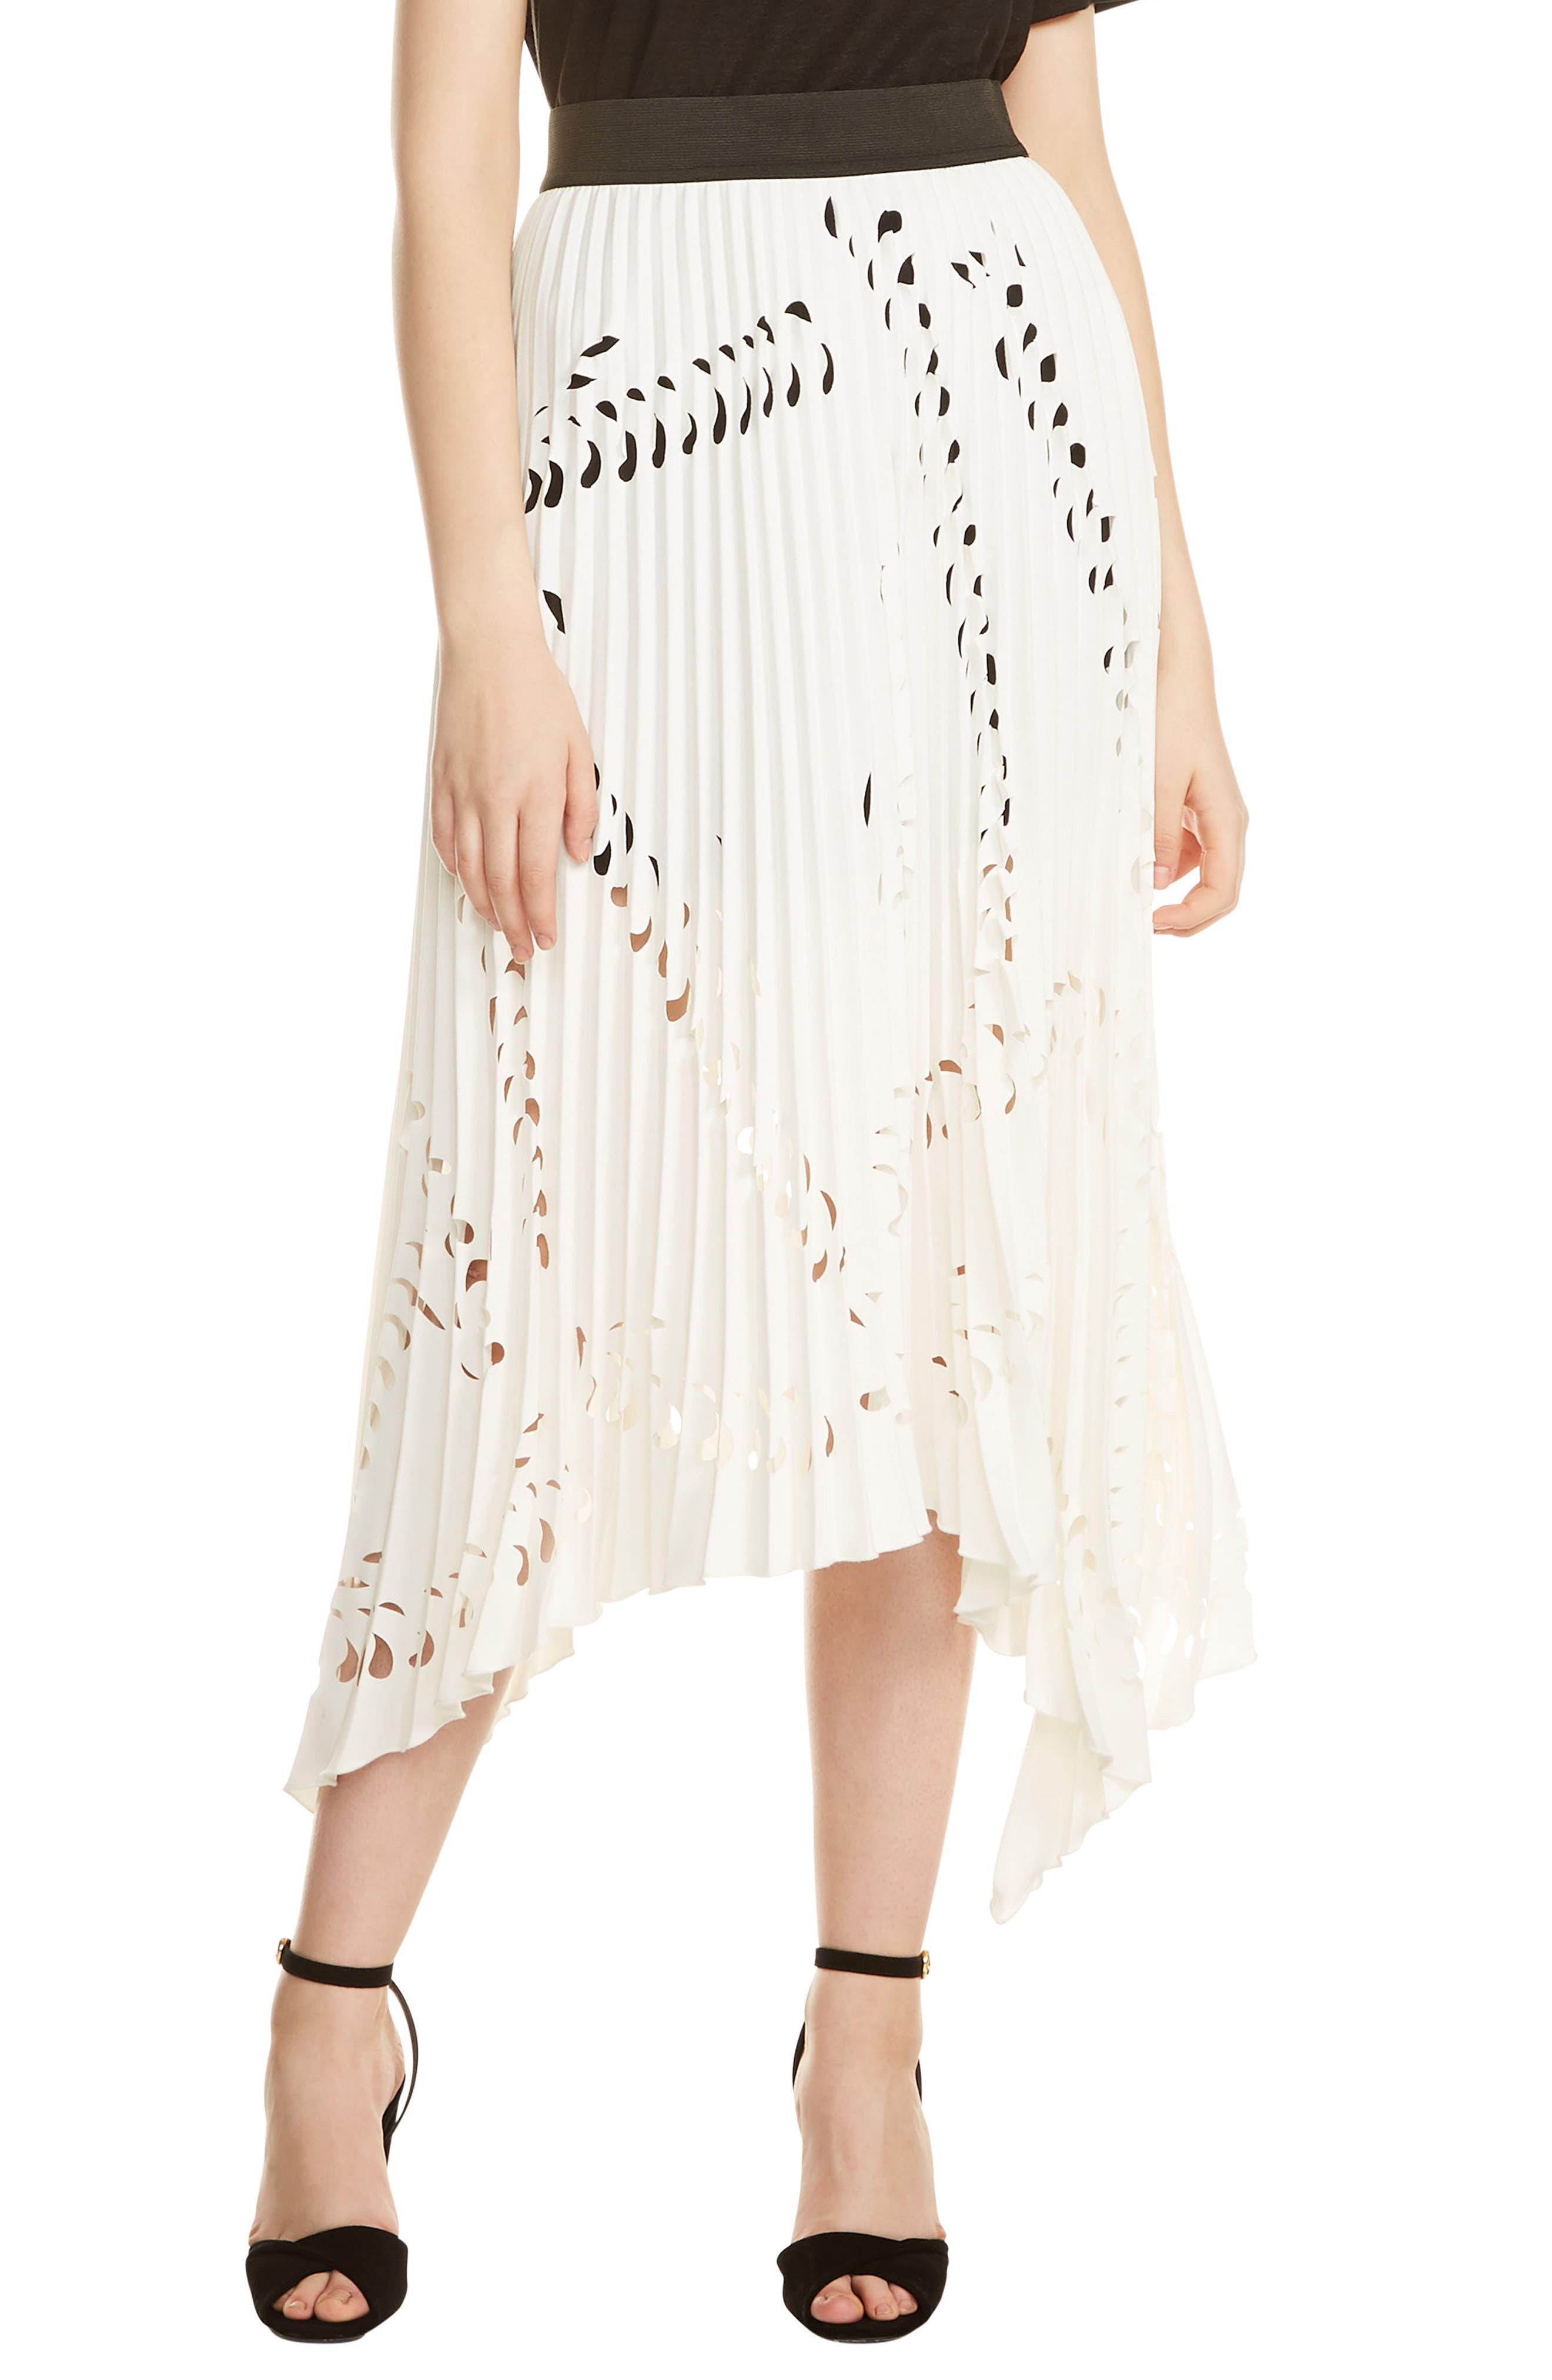 Jeflexe Cutout Pleat Midi Skirt,                             Main thumbnail 1, color,                             100